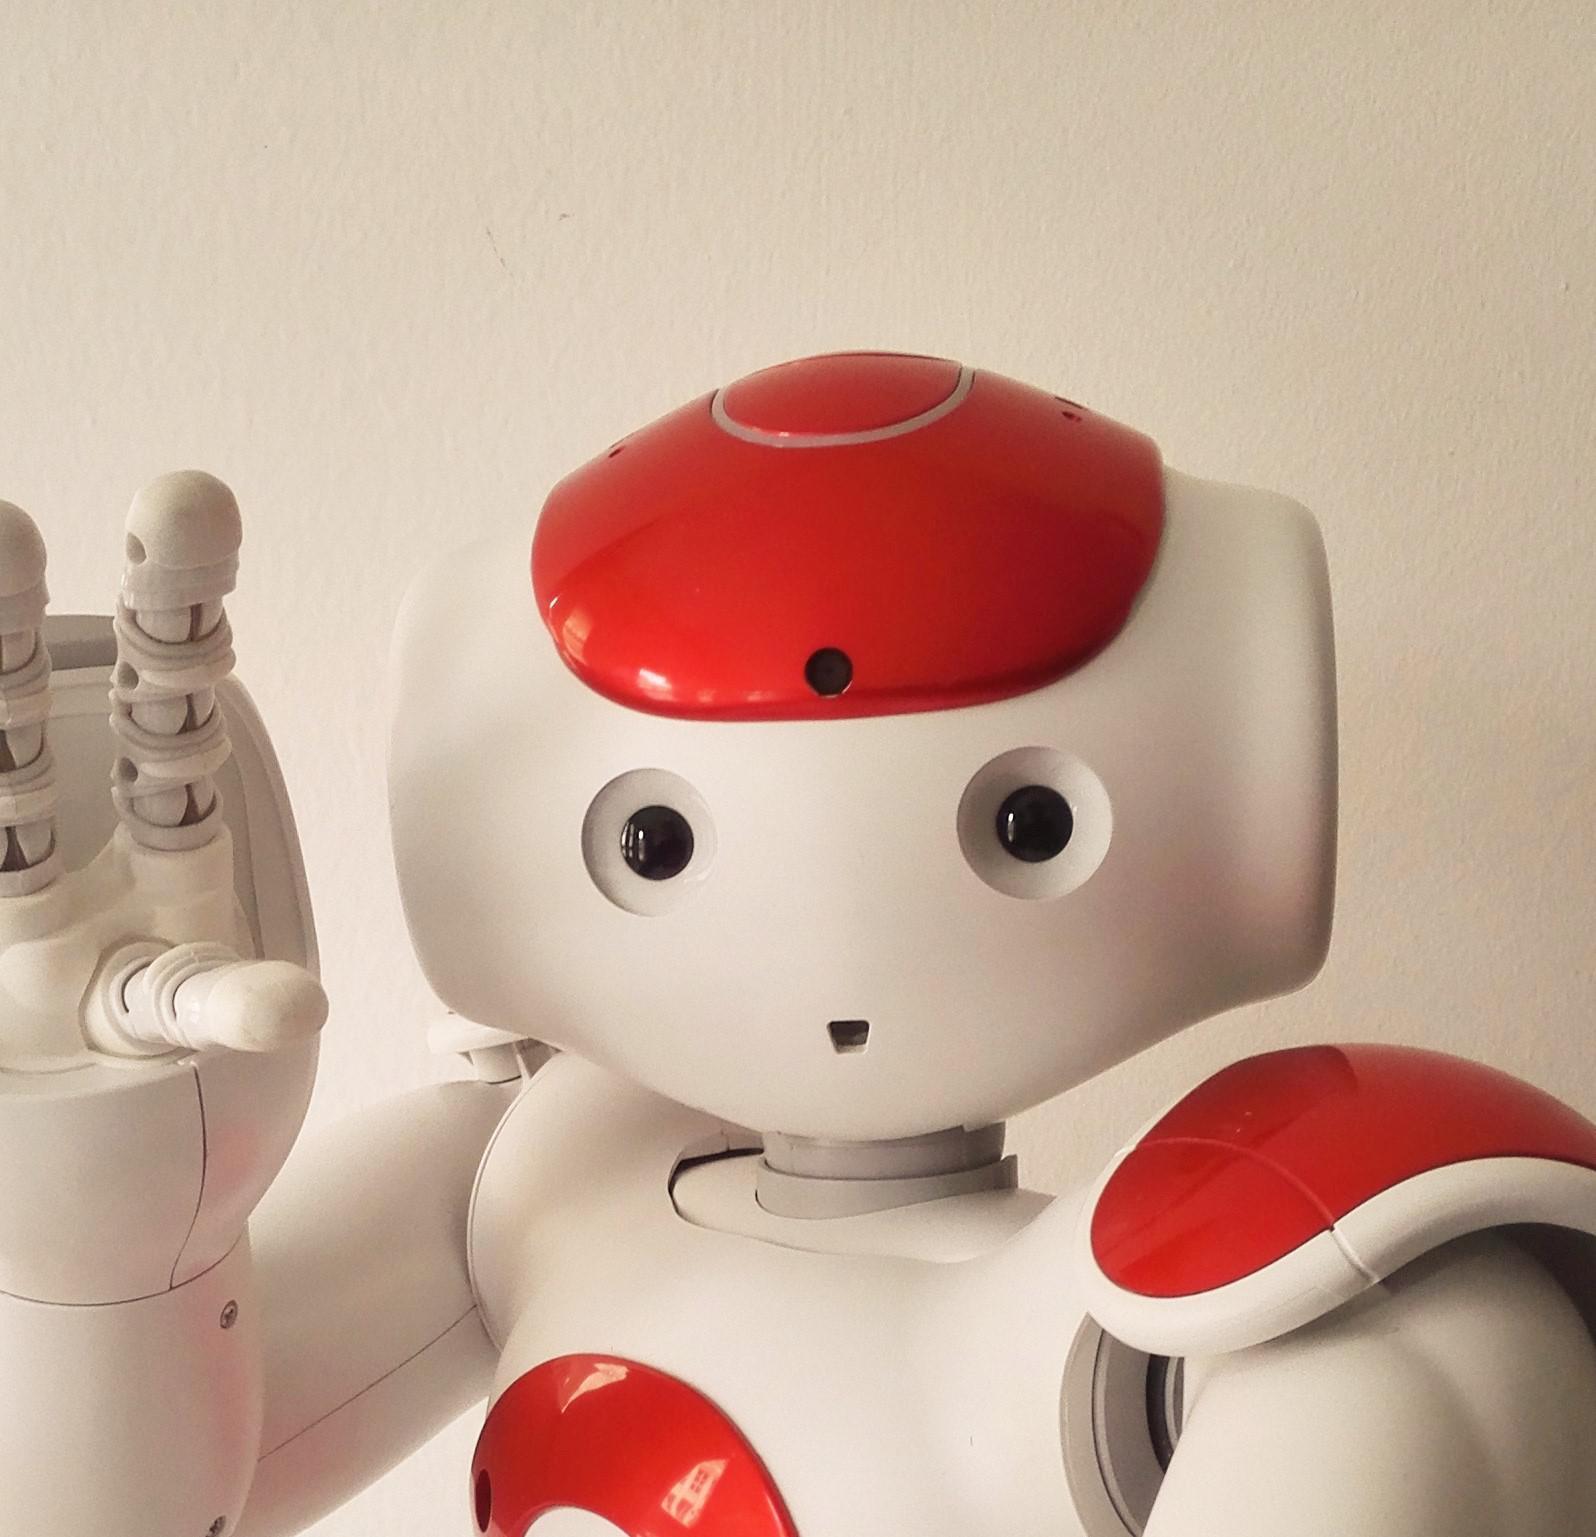 Club Robot | Activité Montpellier Adra à Antigone (34)